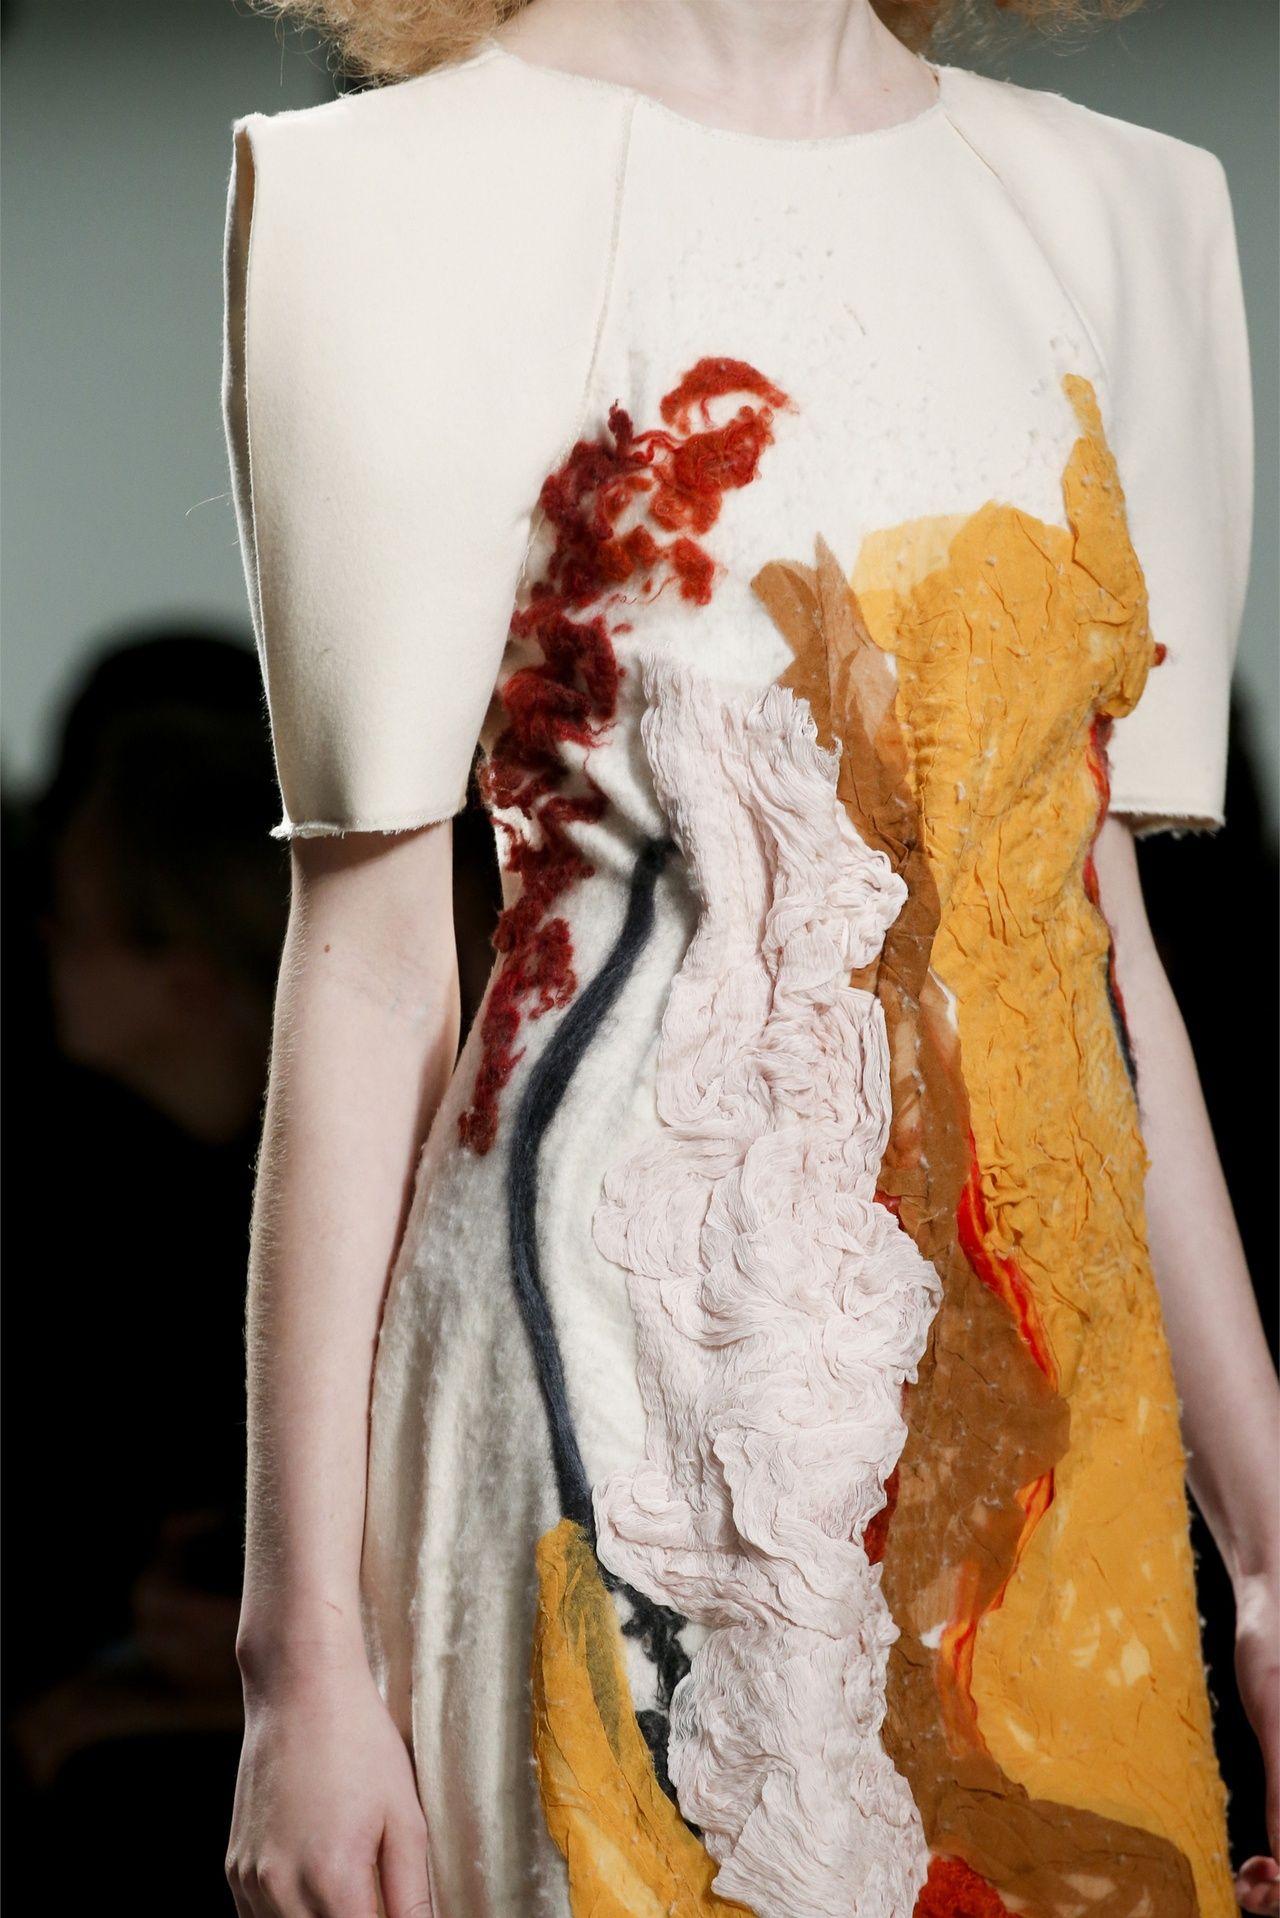 Bottega Veneta F/W '13   incredible, looks like some felting and other kind of fabric process